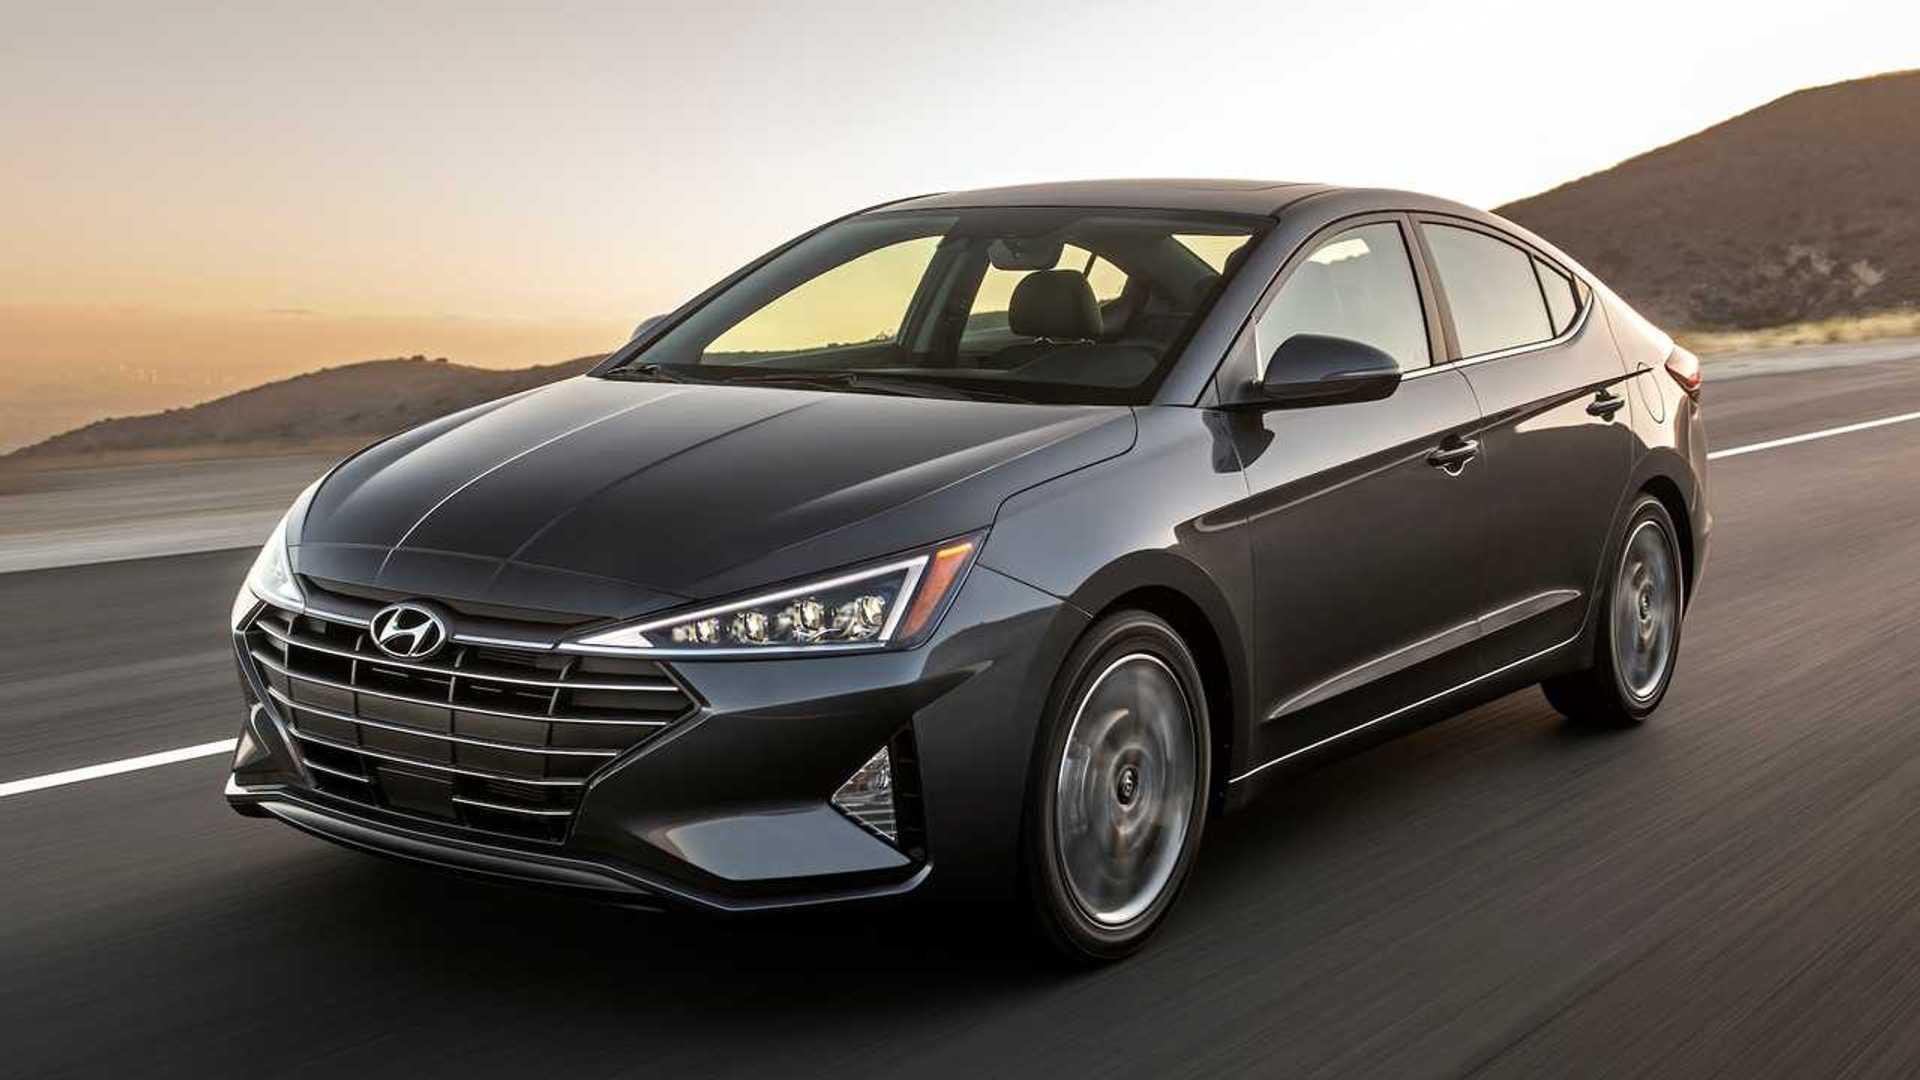 2020 Hyundai Elantra Redesign